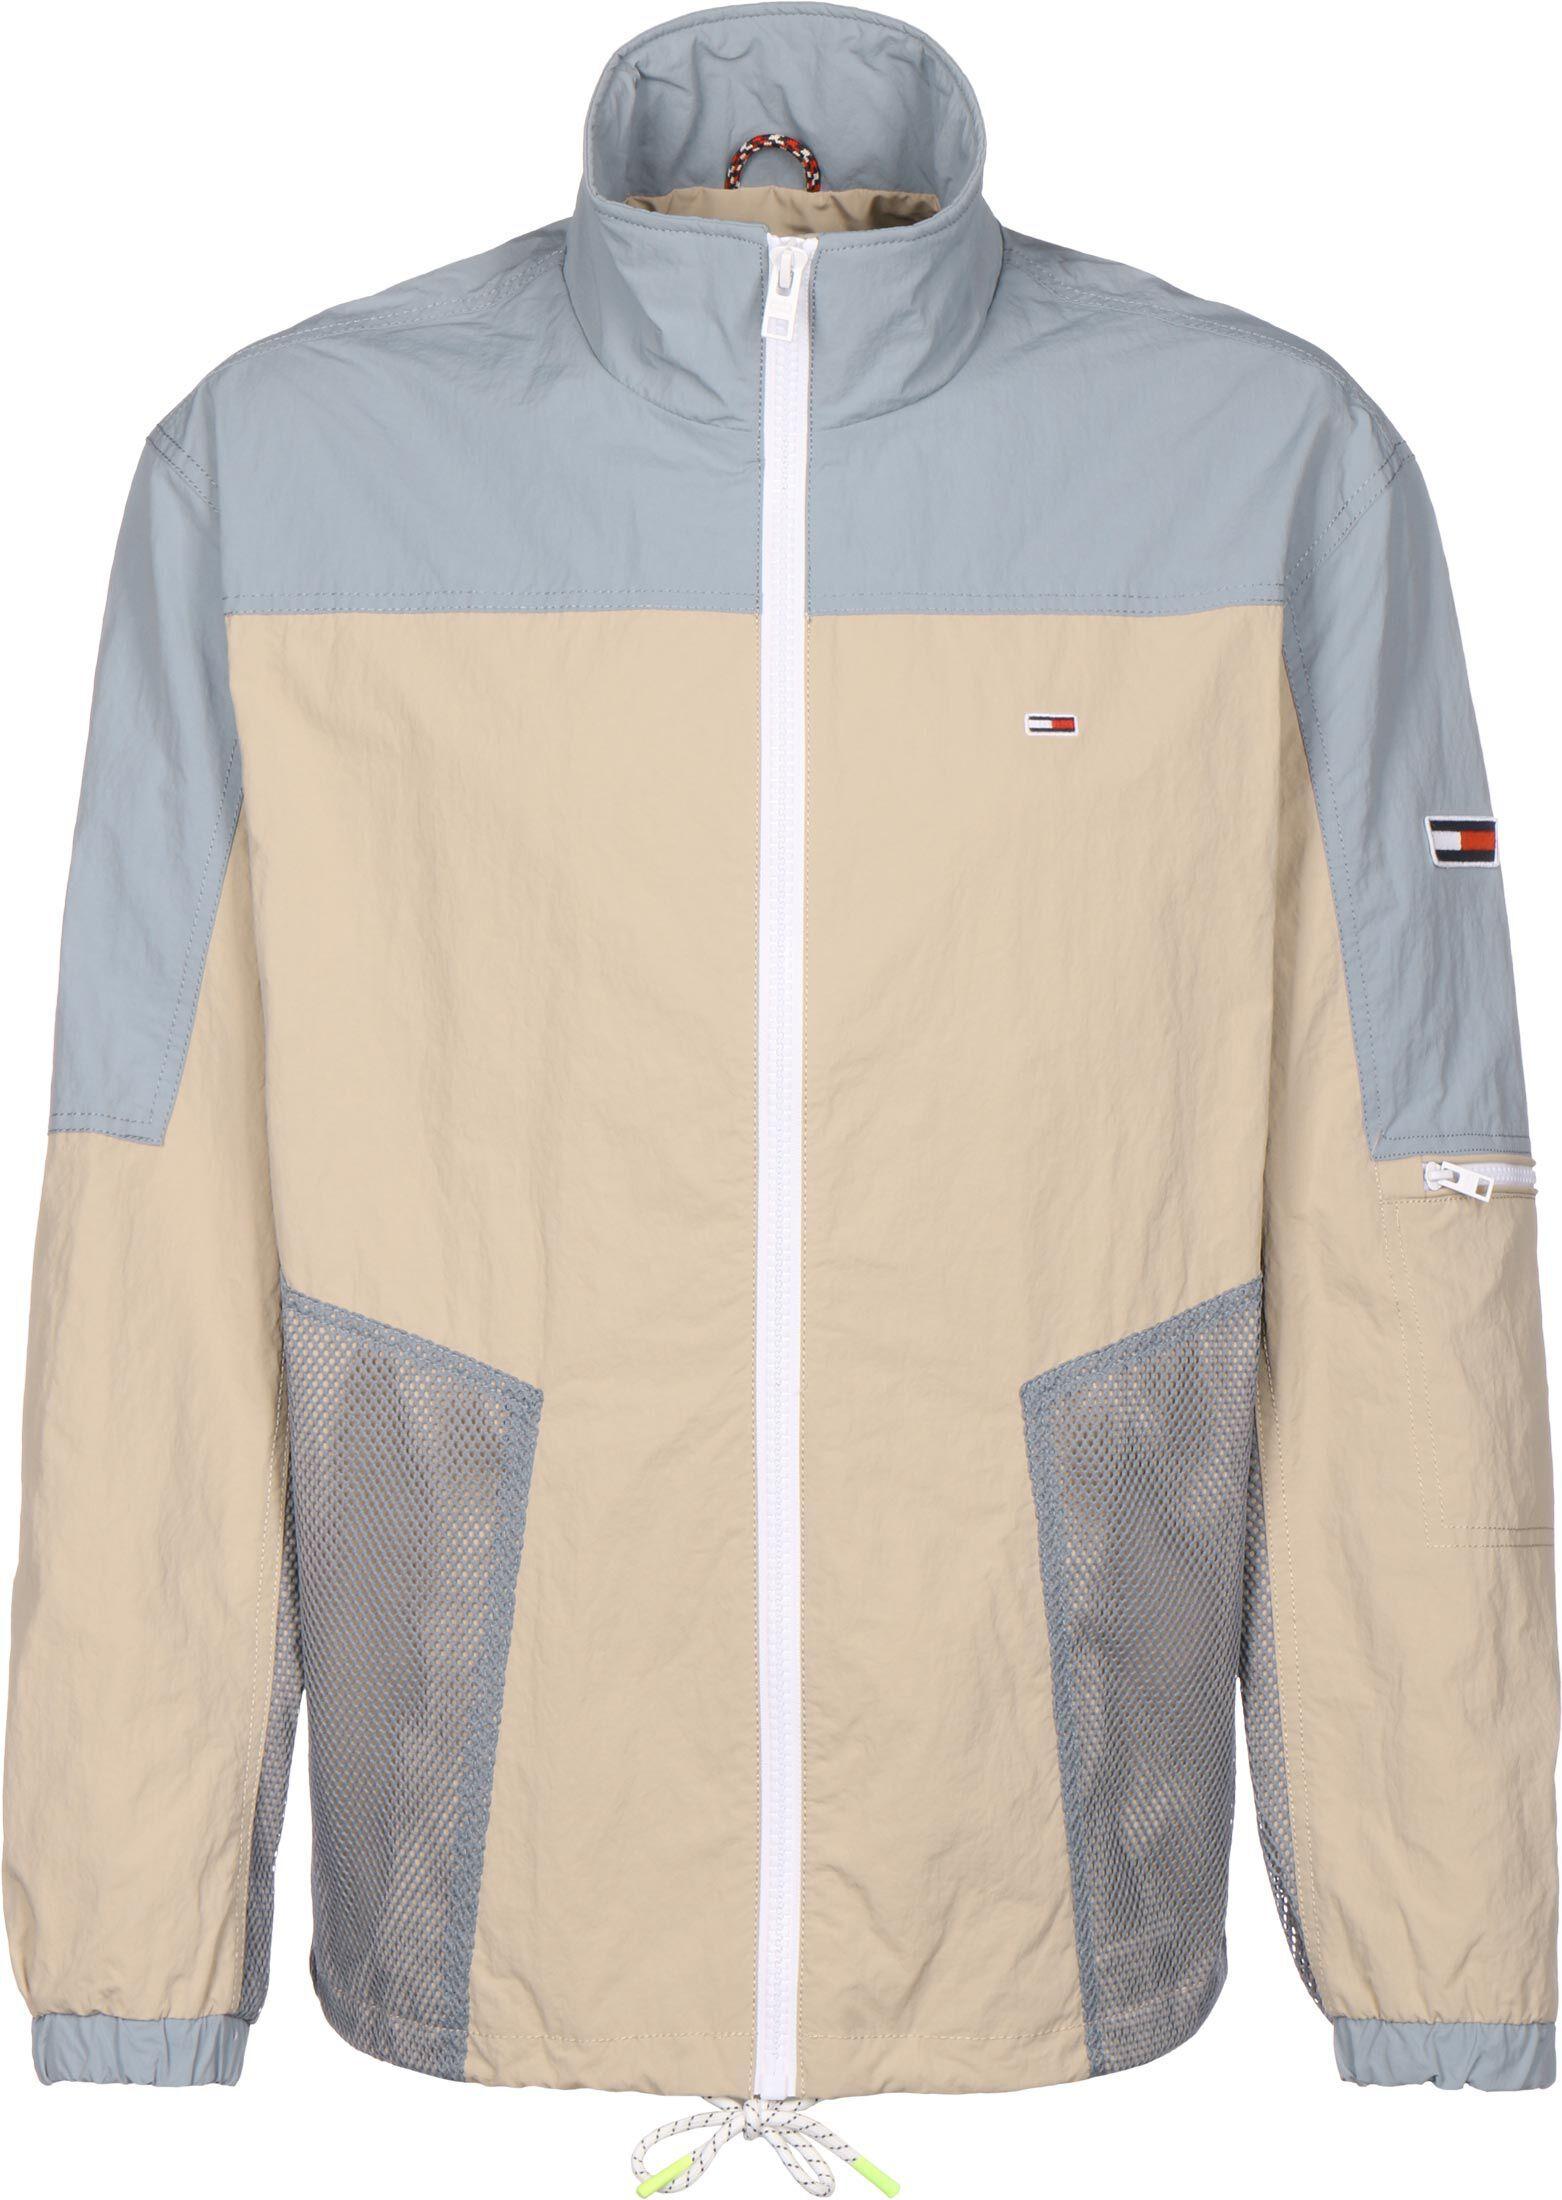 Tommy Jeans Mix Media Colorblock, taille XL, homme, beige bleu